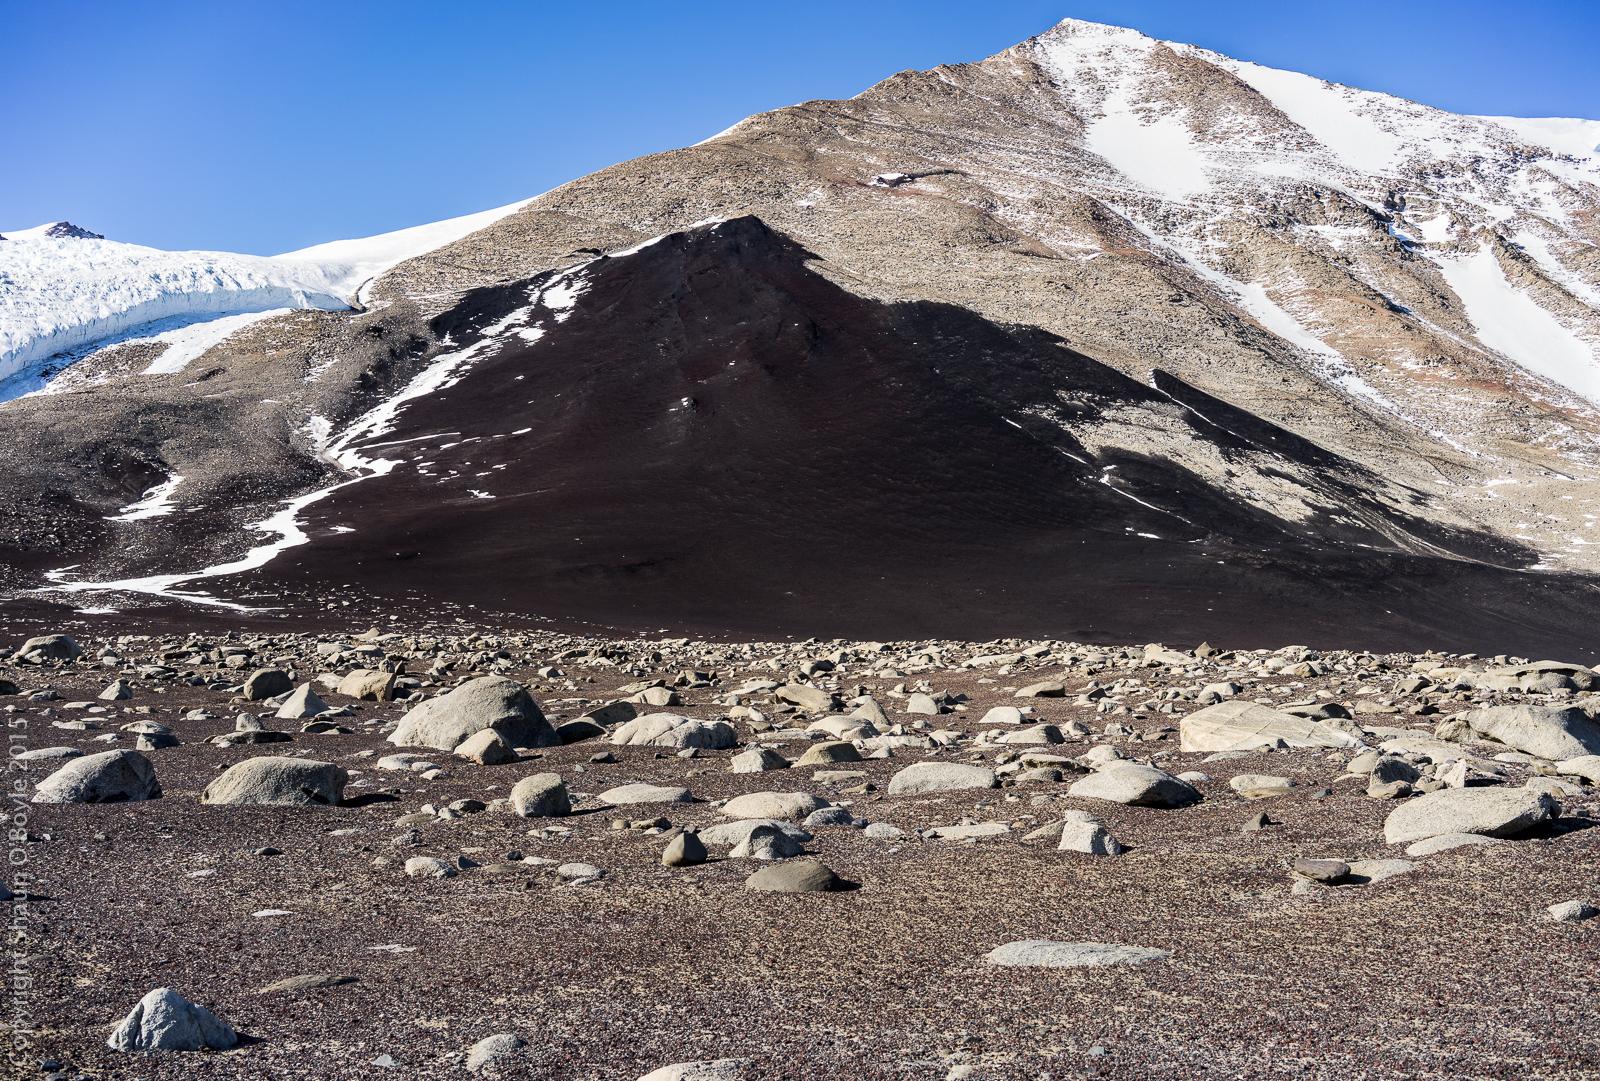 Patch of black volcanic rock.